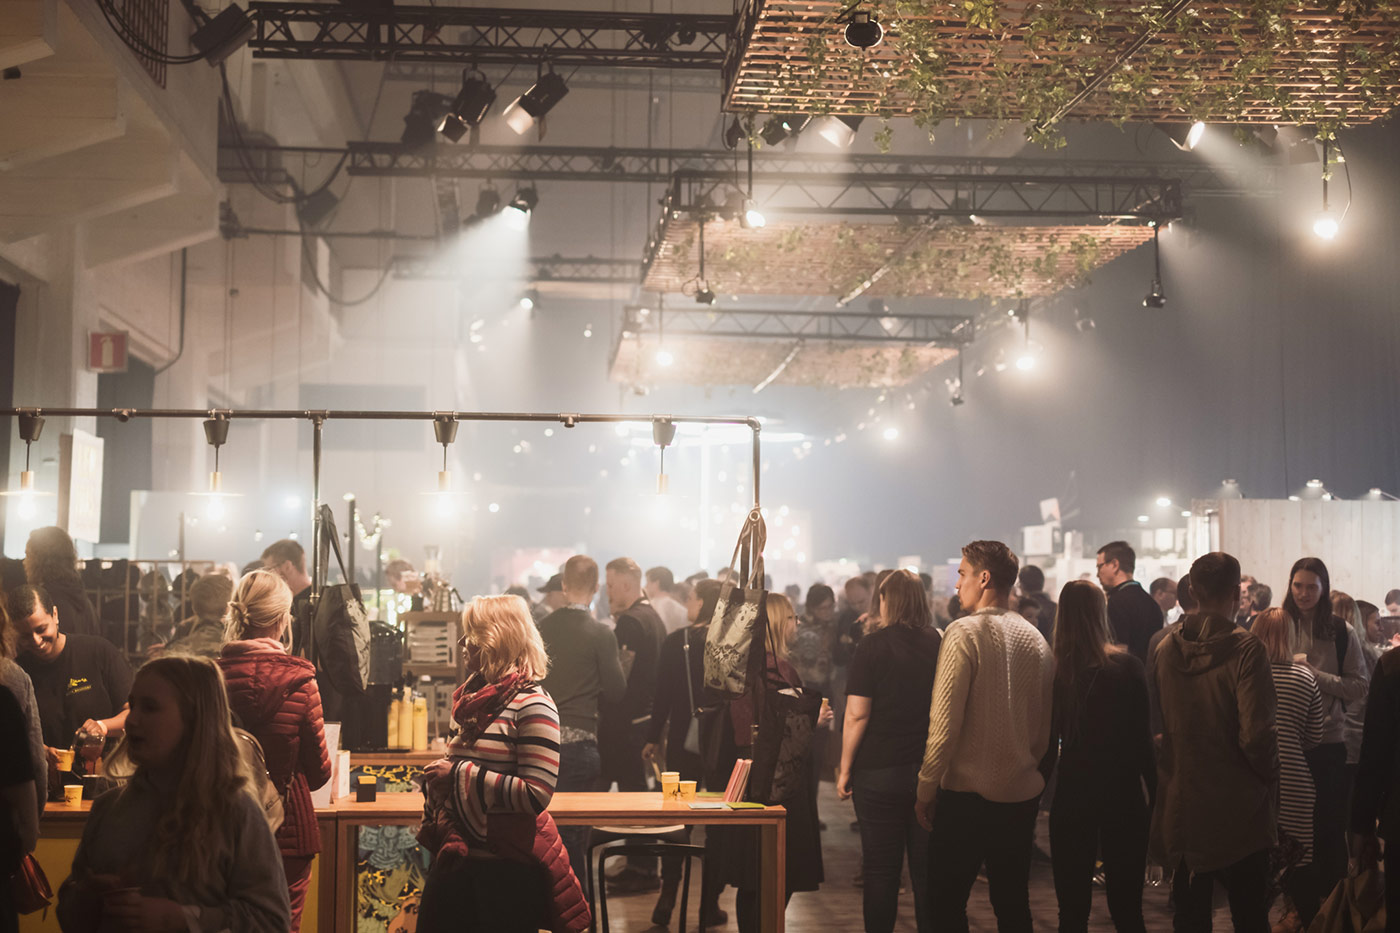 Kaffee-Events, Festival und Kalender: Helsinki Coffee Festival. CafCaf – Kaffee & Blog, Kaffeeblog